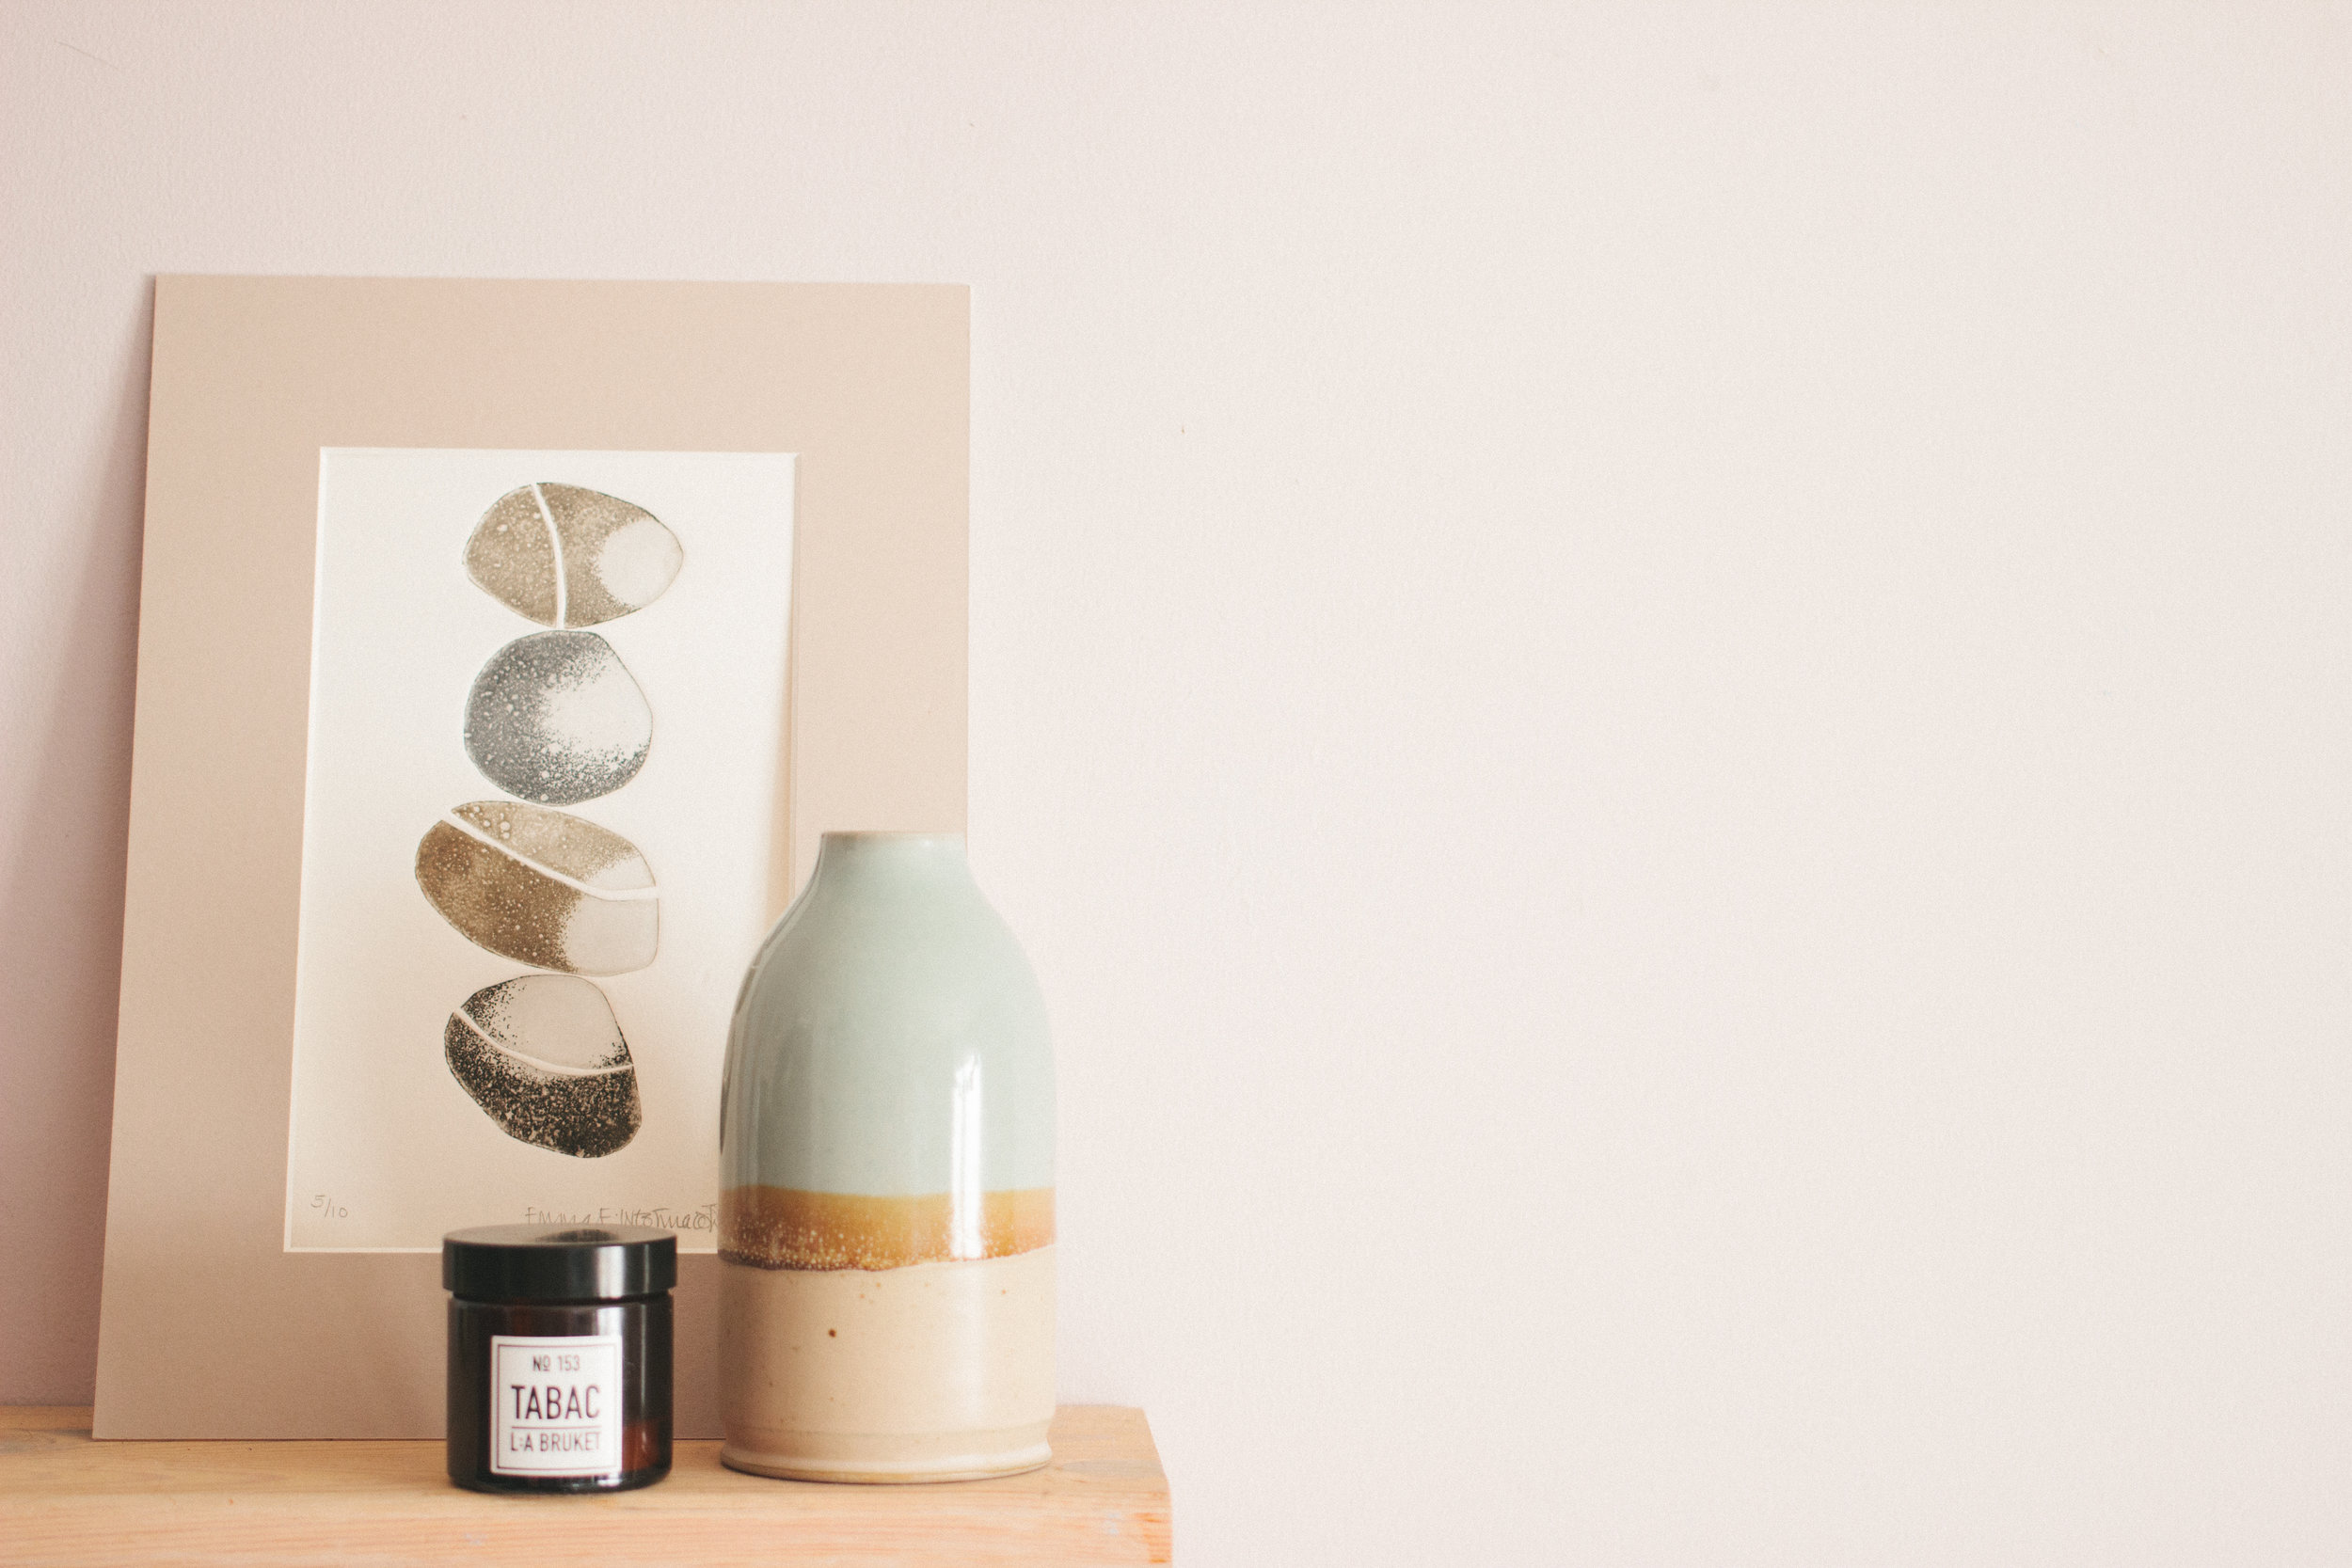 Left to right:  Emma Westmacott pebbles etching, L:A Bruket candle, We Make Pots vase